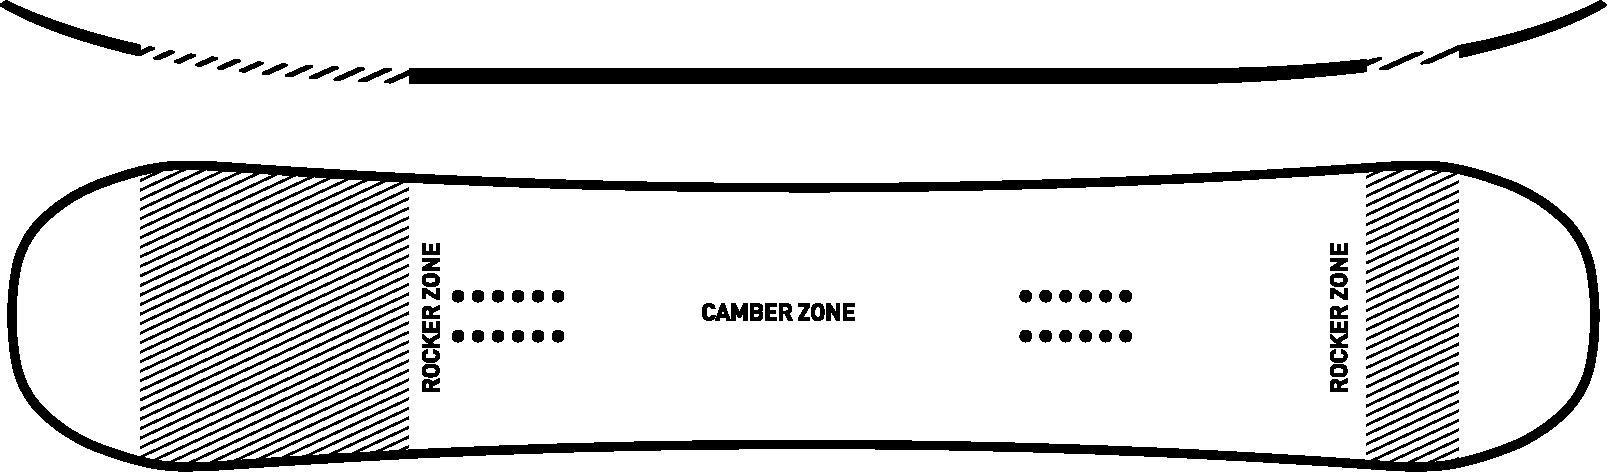 directional-hybrid-camber.jpg